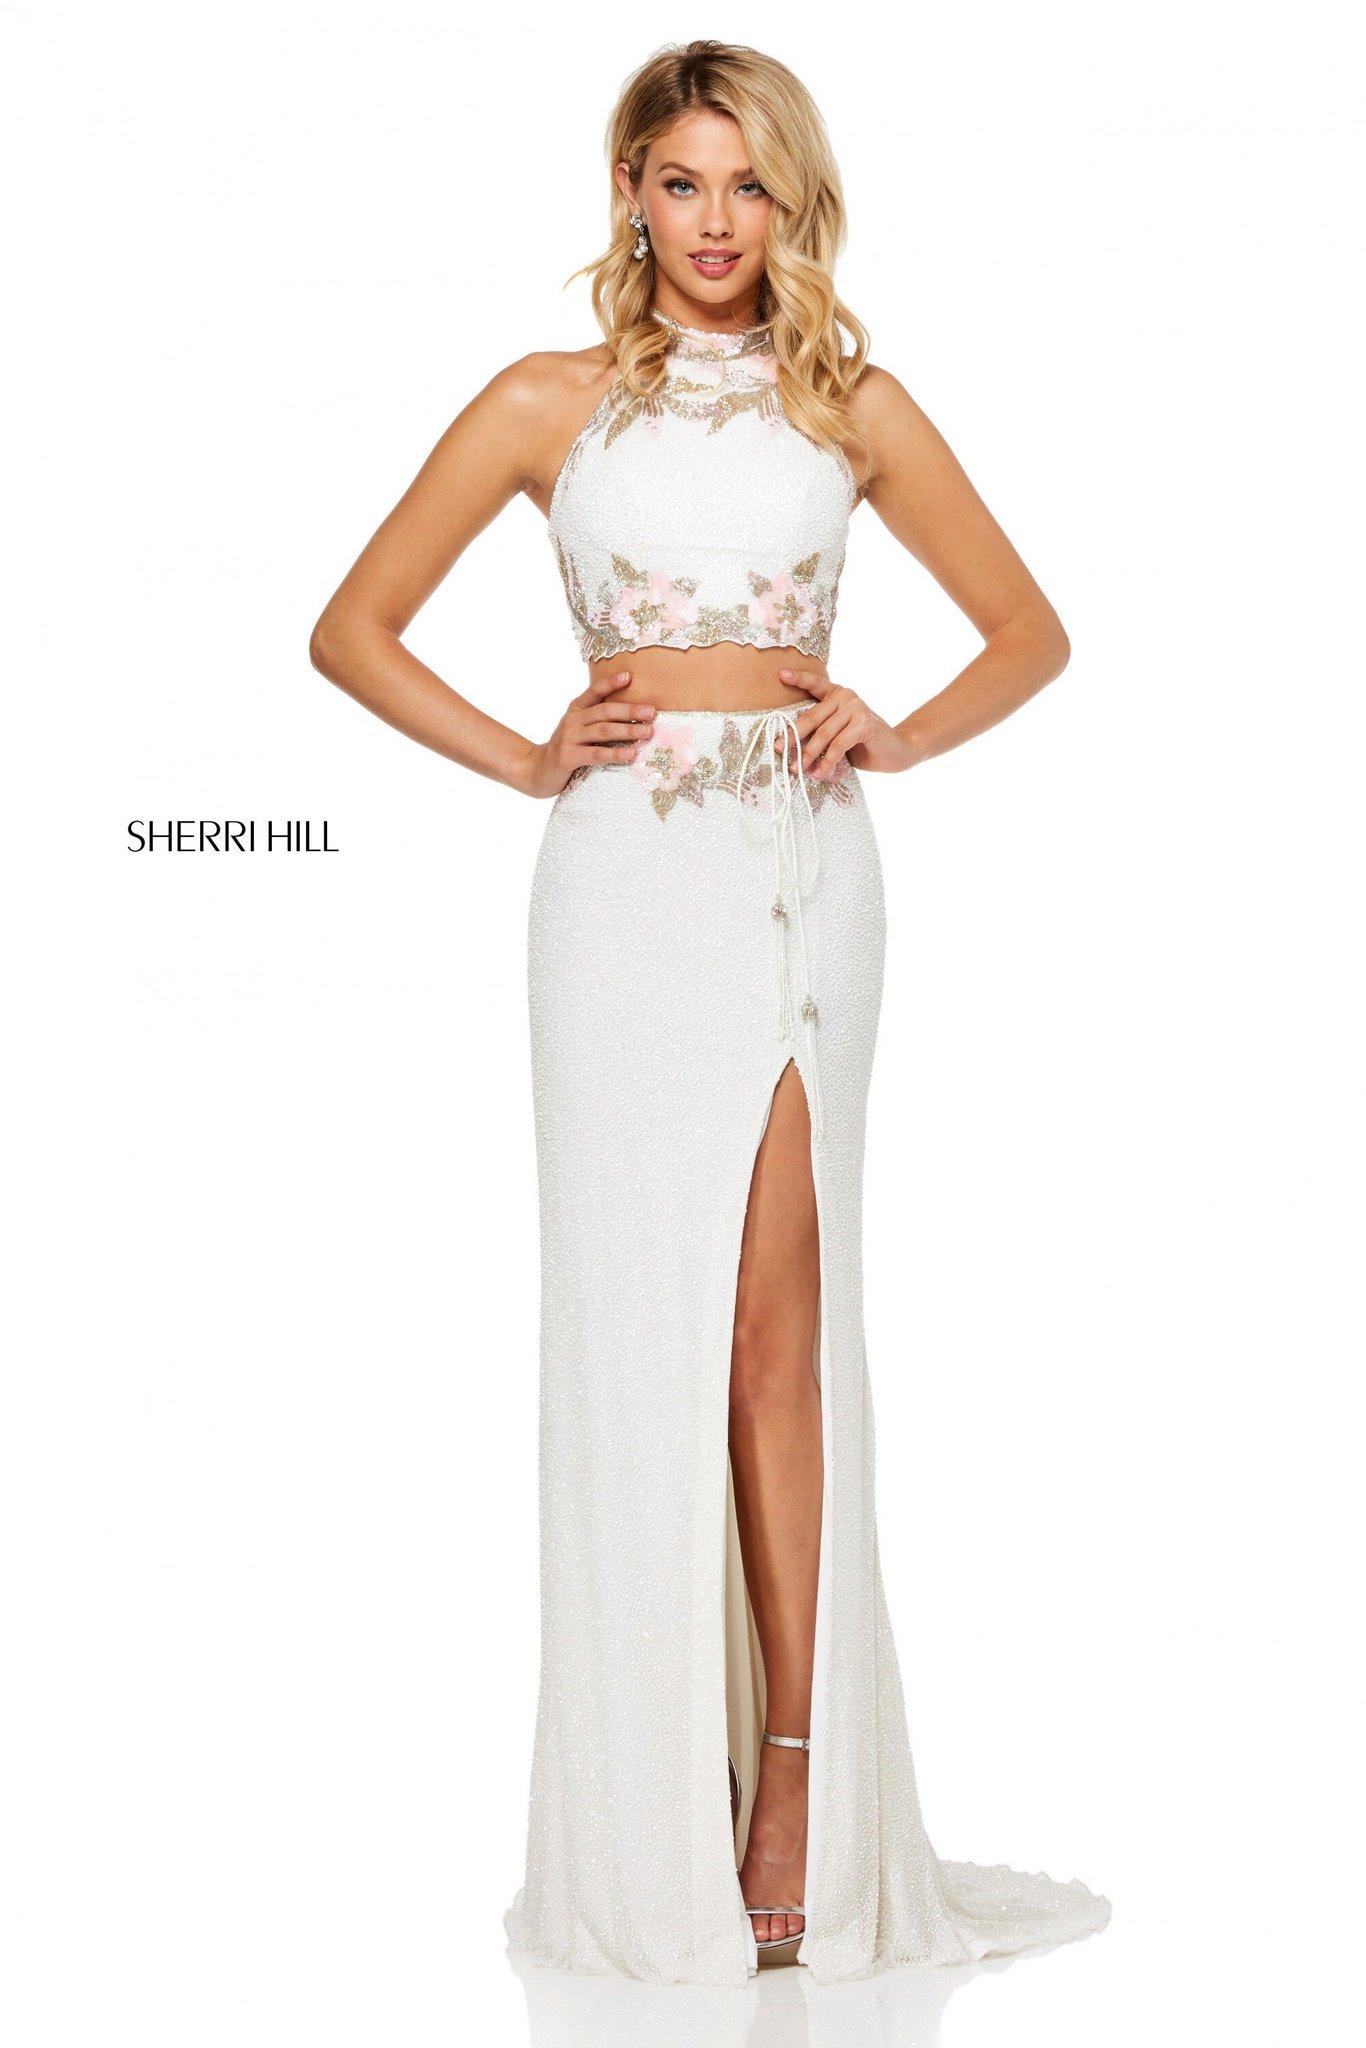 Sherri Hill 52682 Длинное платье кроп-топ (Crop Top)